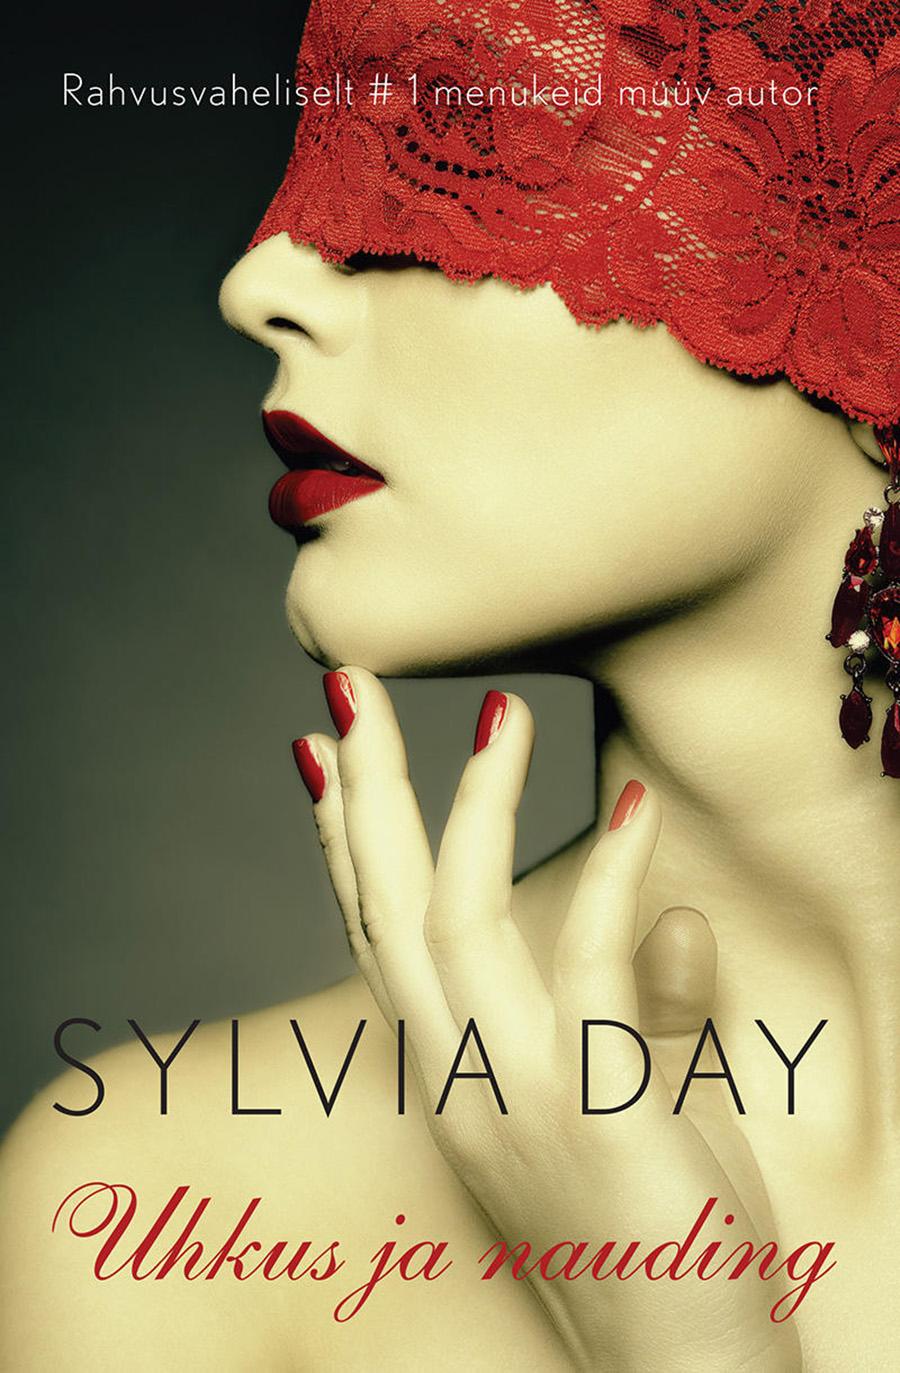 pride and pleasure estonia sylvia day